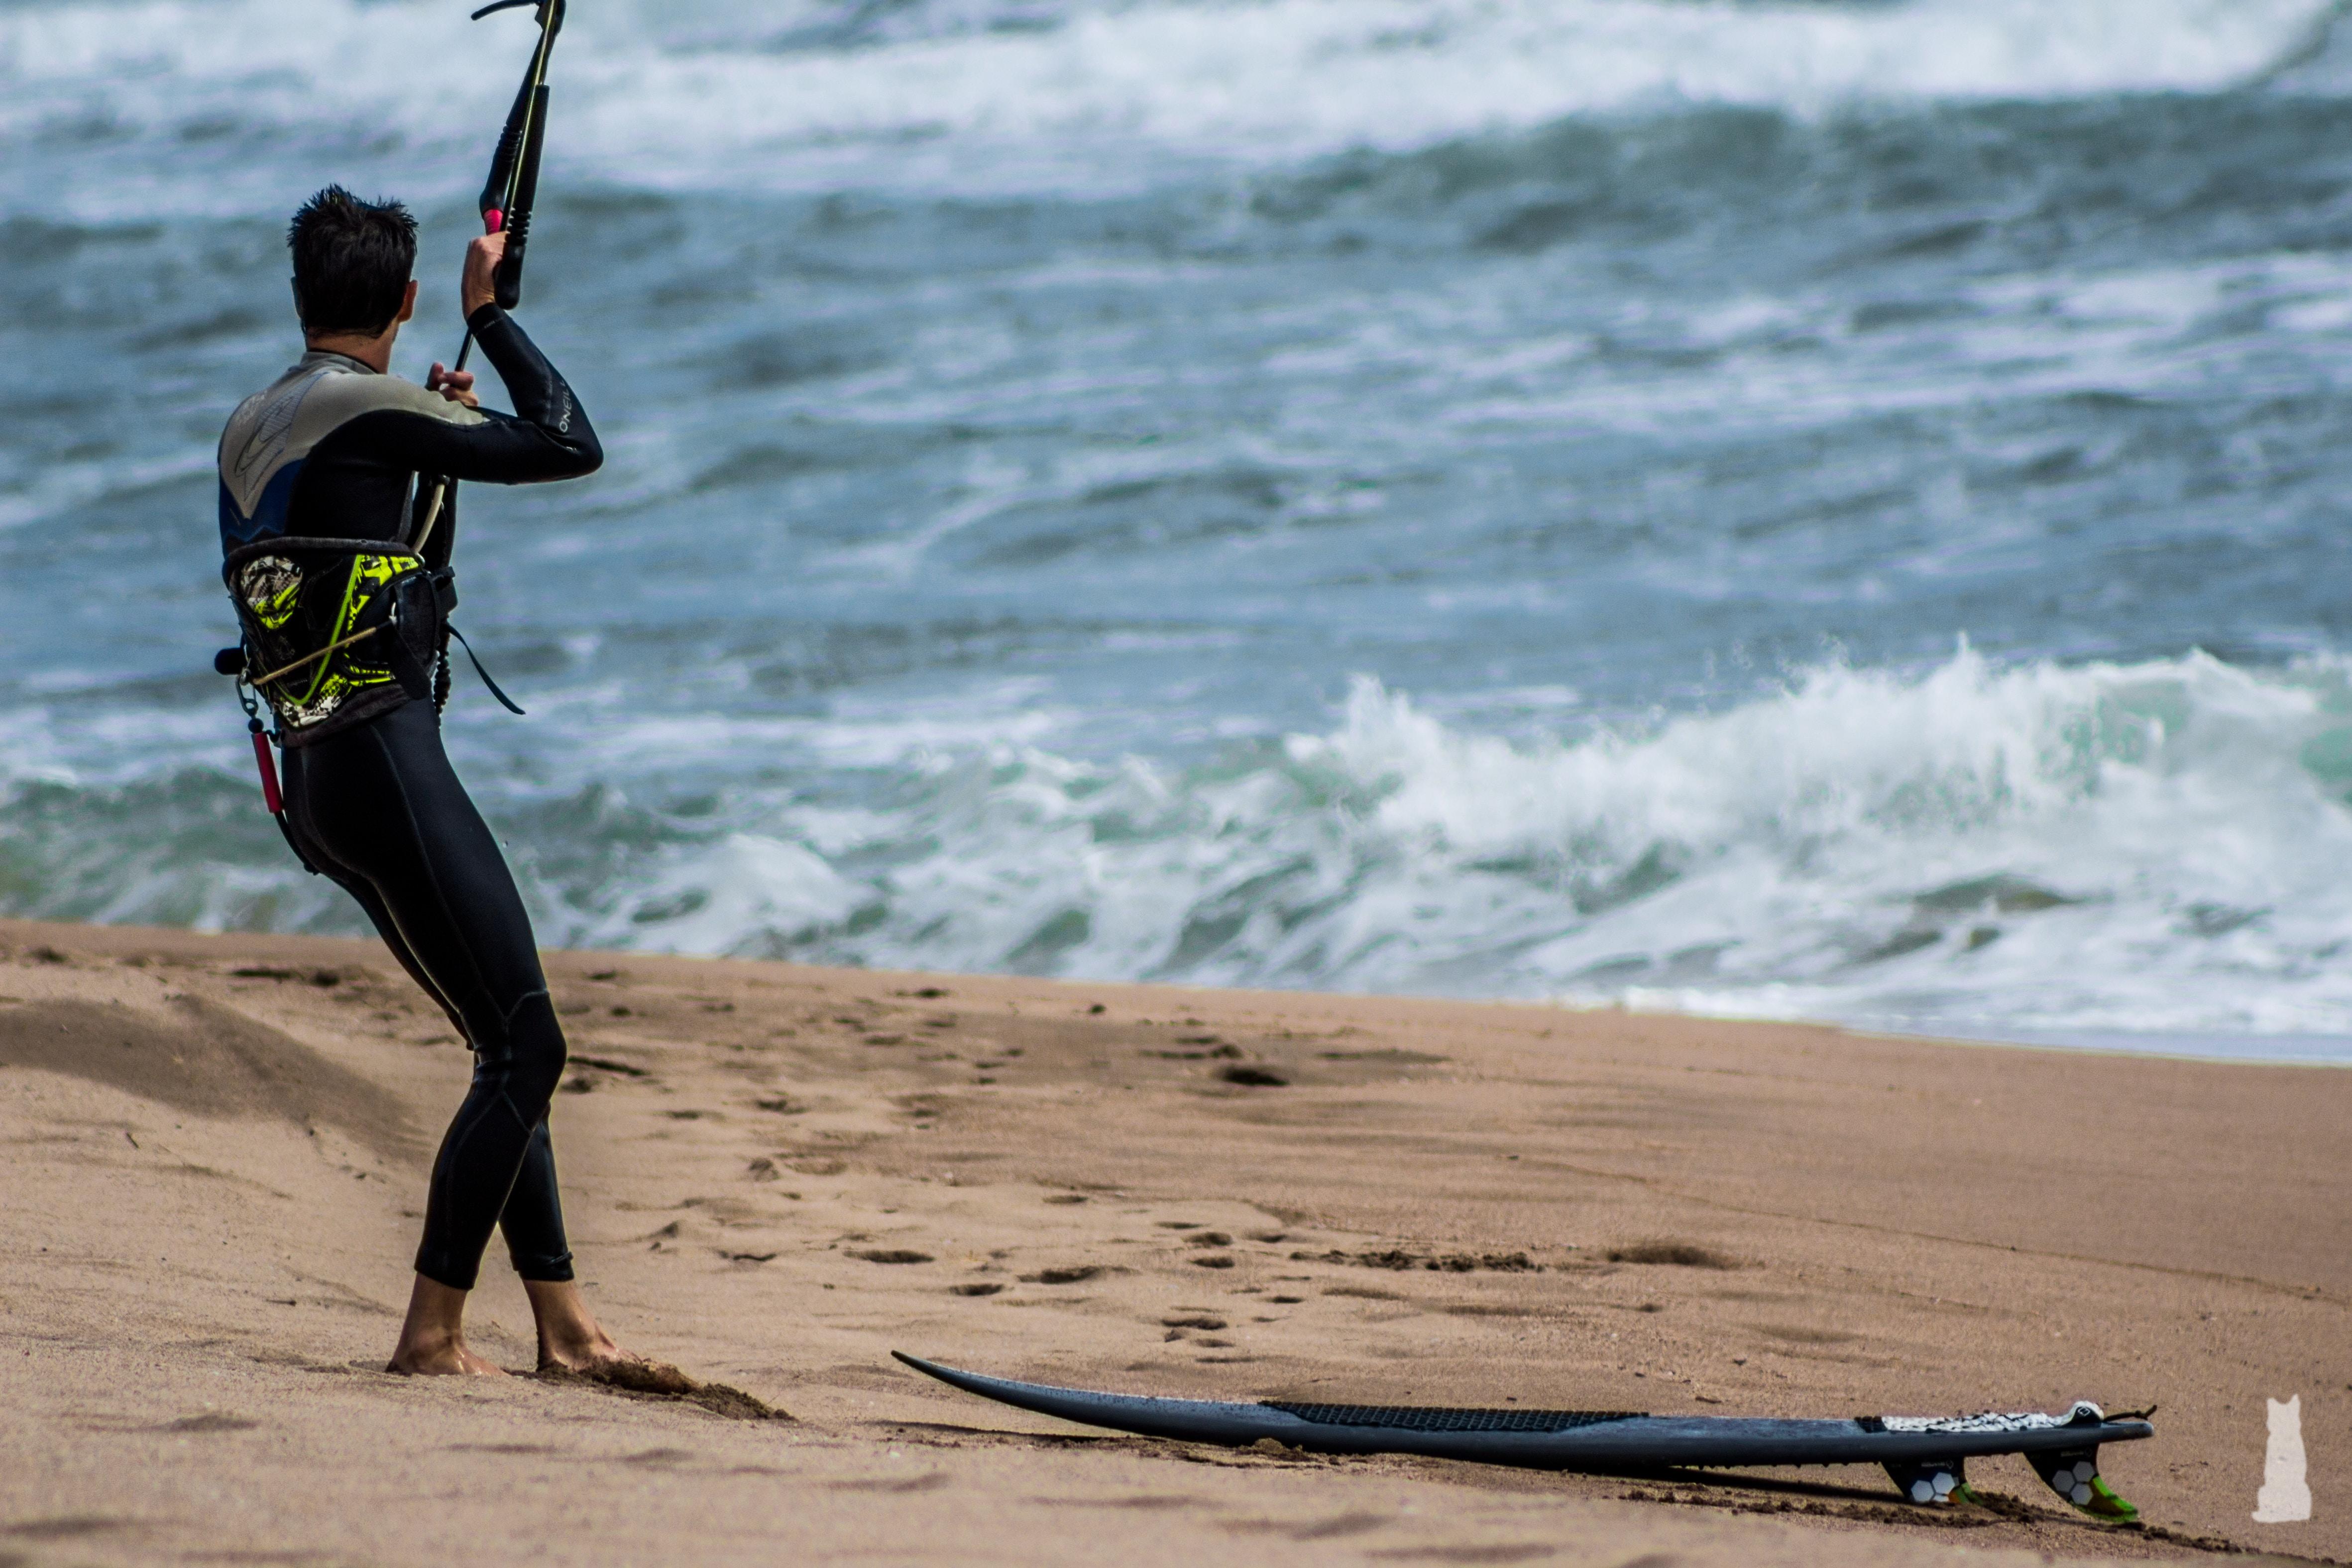 man in wet suit standing beside surfboard on seashore during daytime